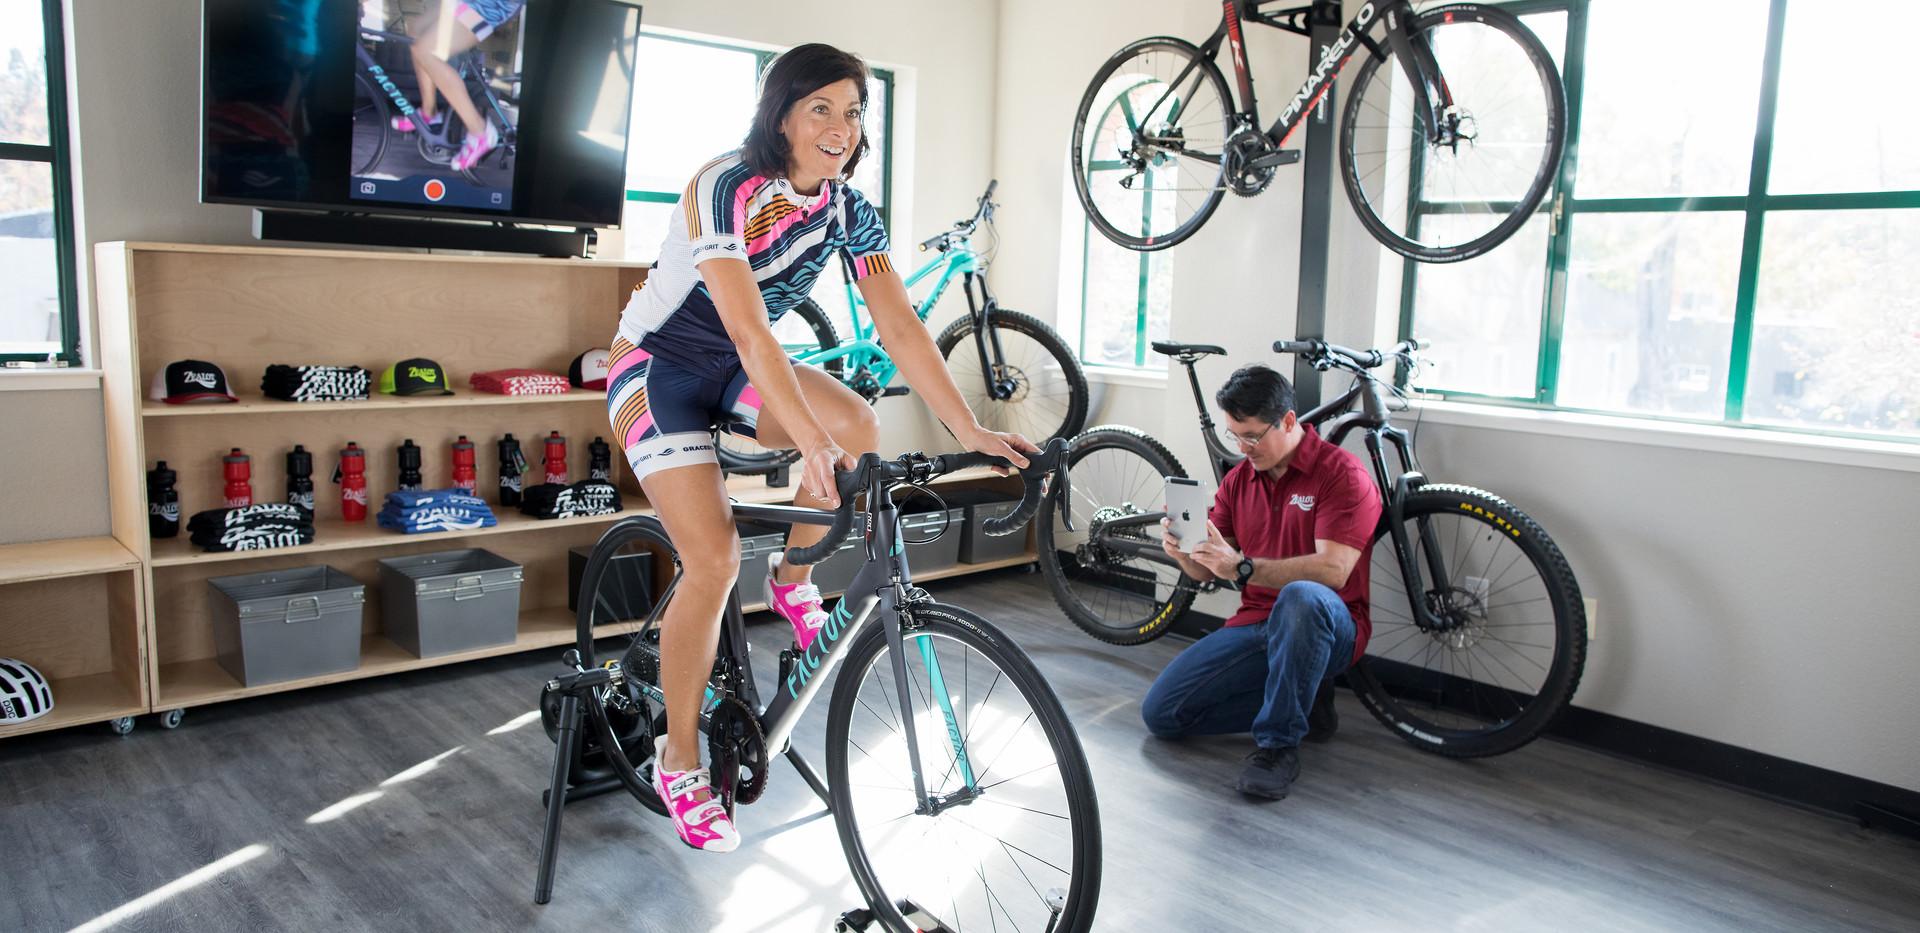 Zealot Cycleworks - Bike Fit Studio